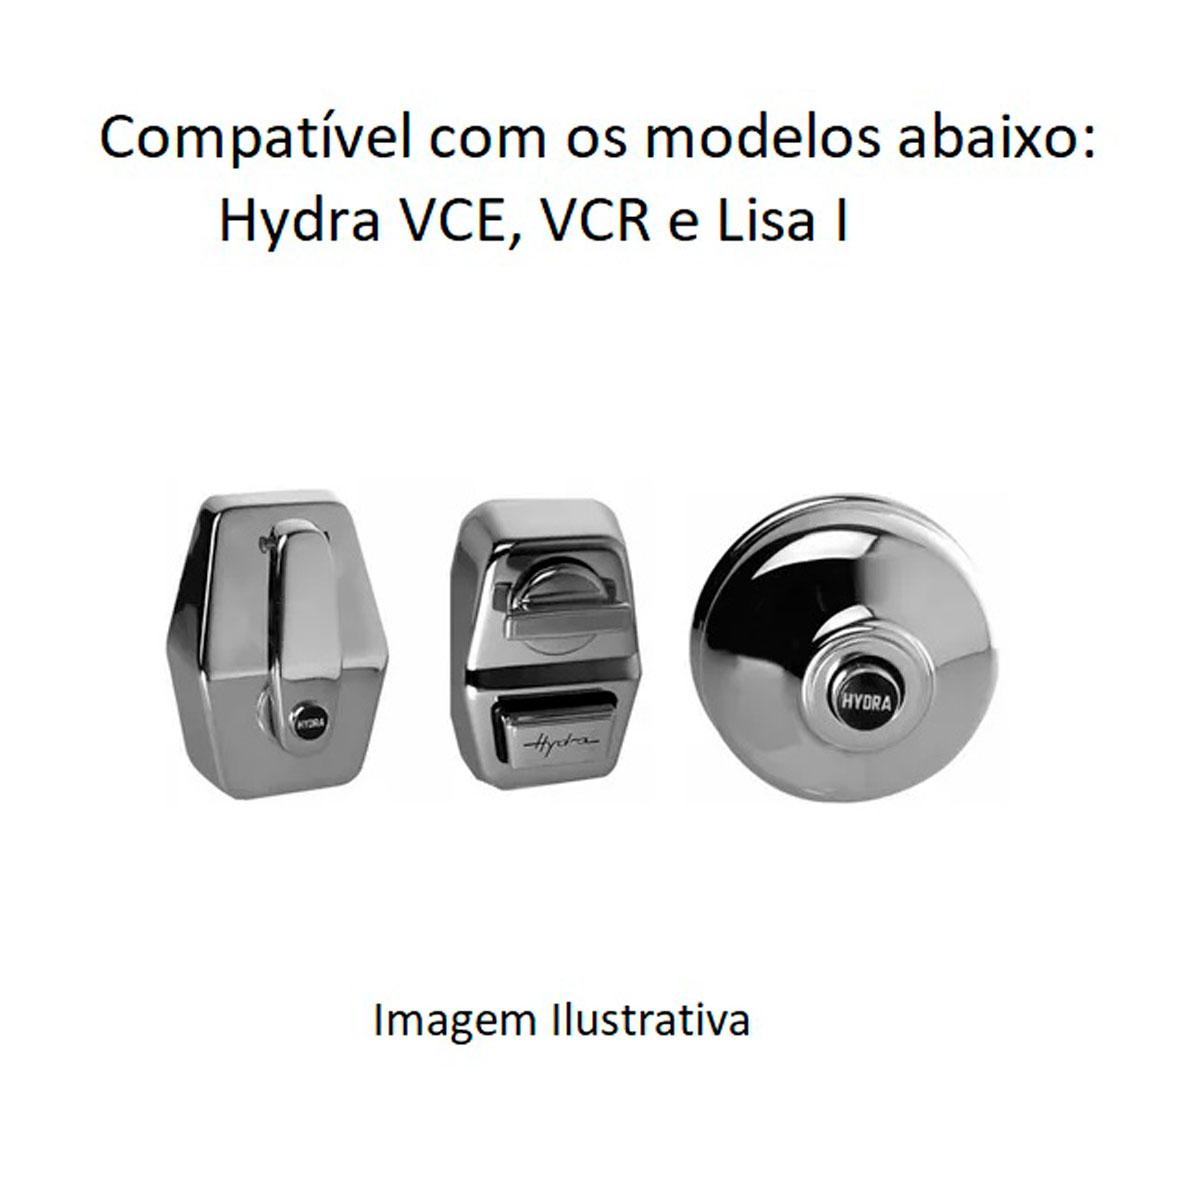 Reparo Válvula Hydra Unificado VCR/VCE/LISA  1.1/2 Original